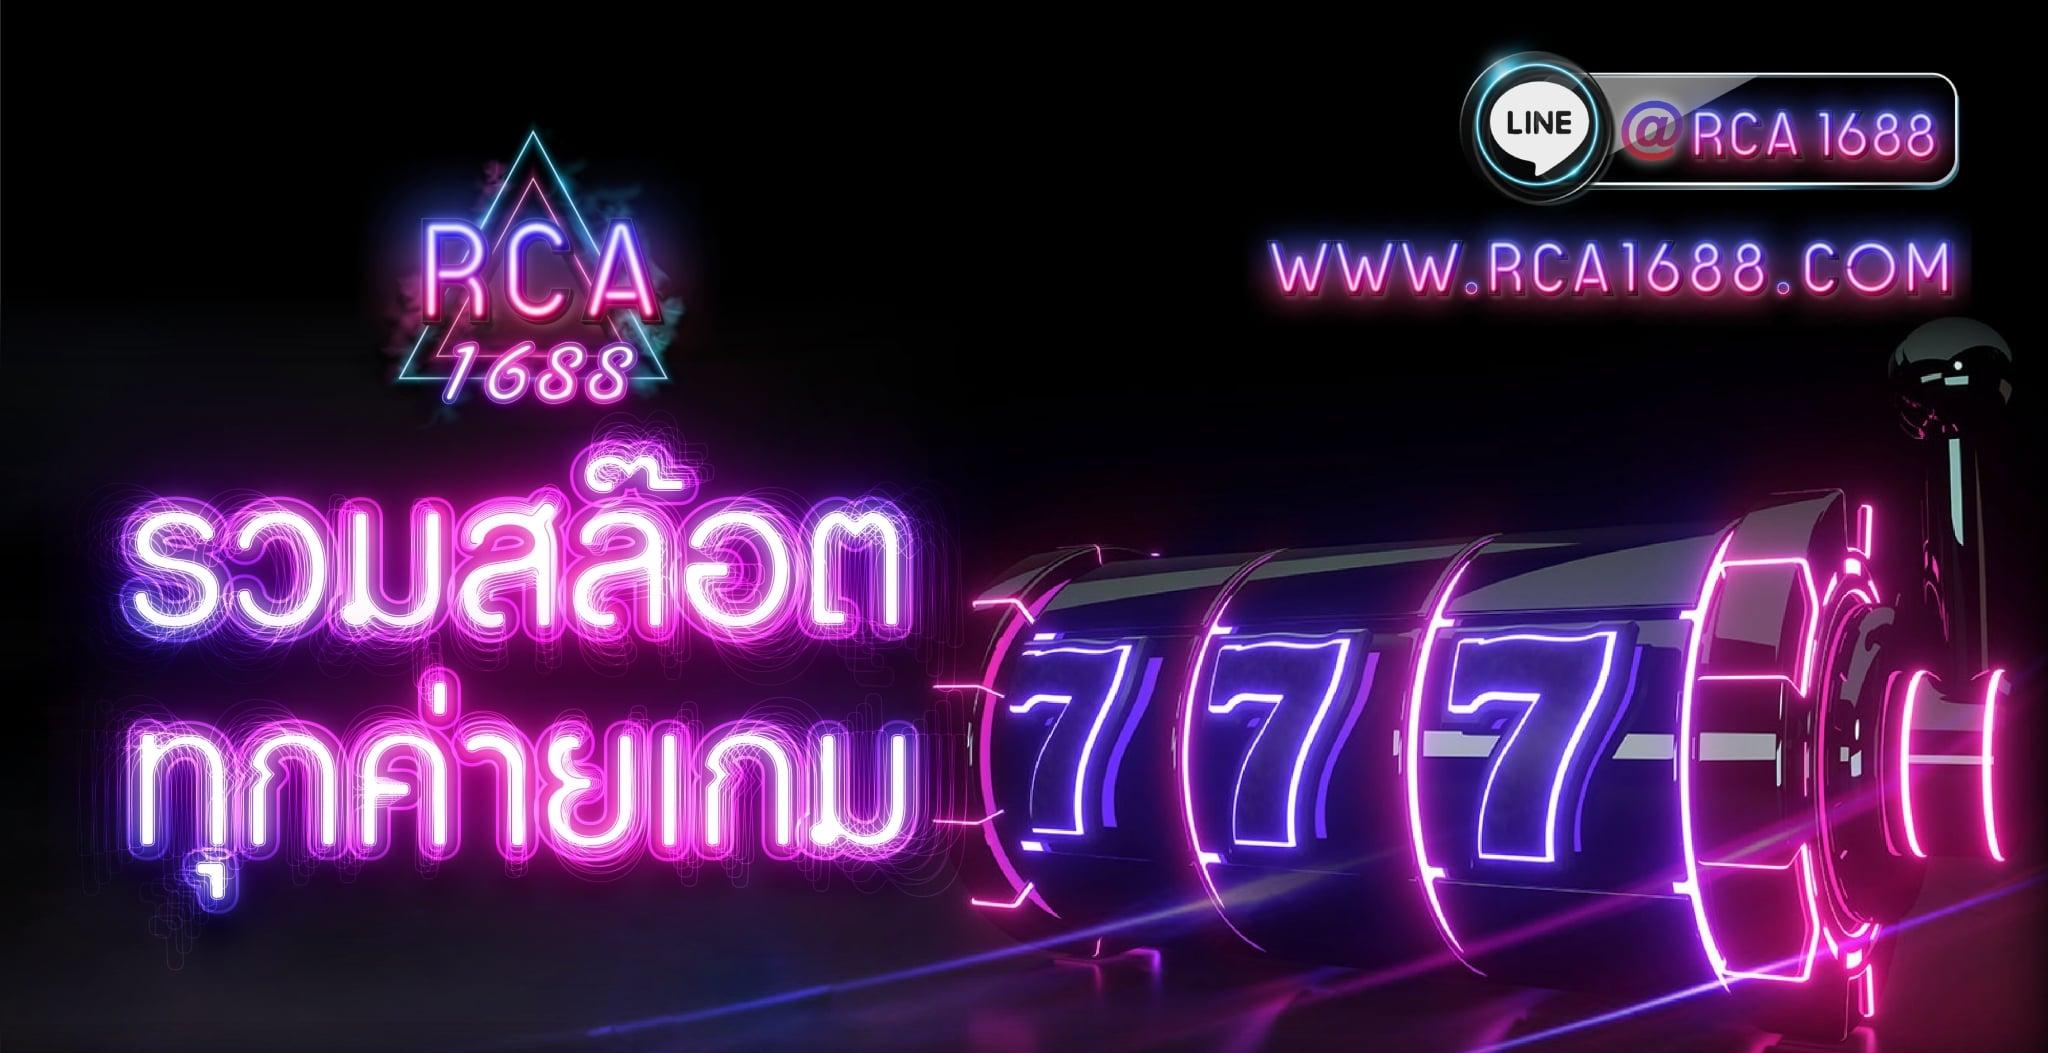 RCA1688_210209_1